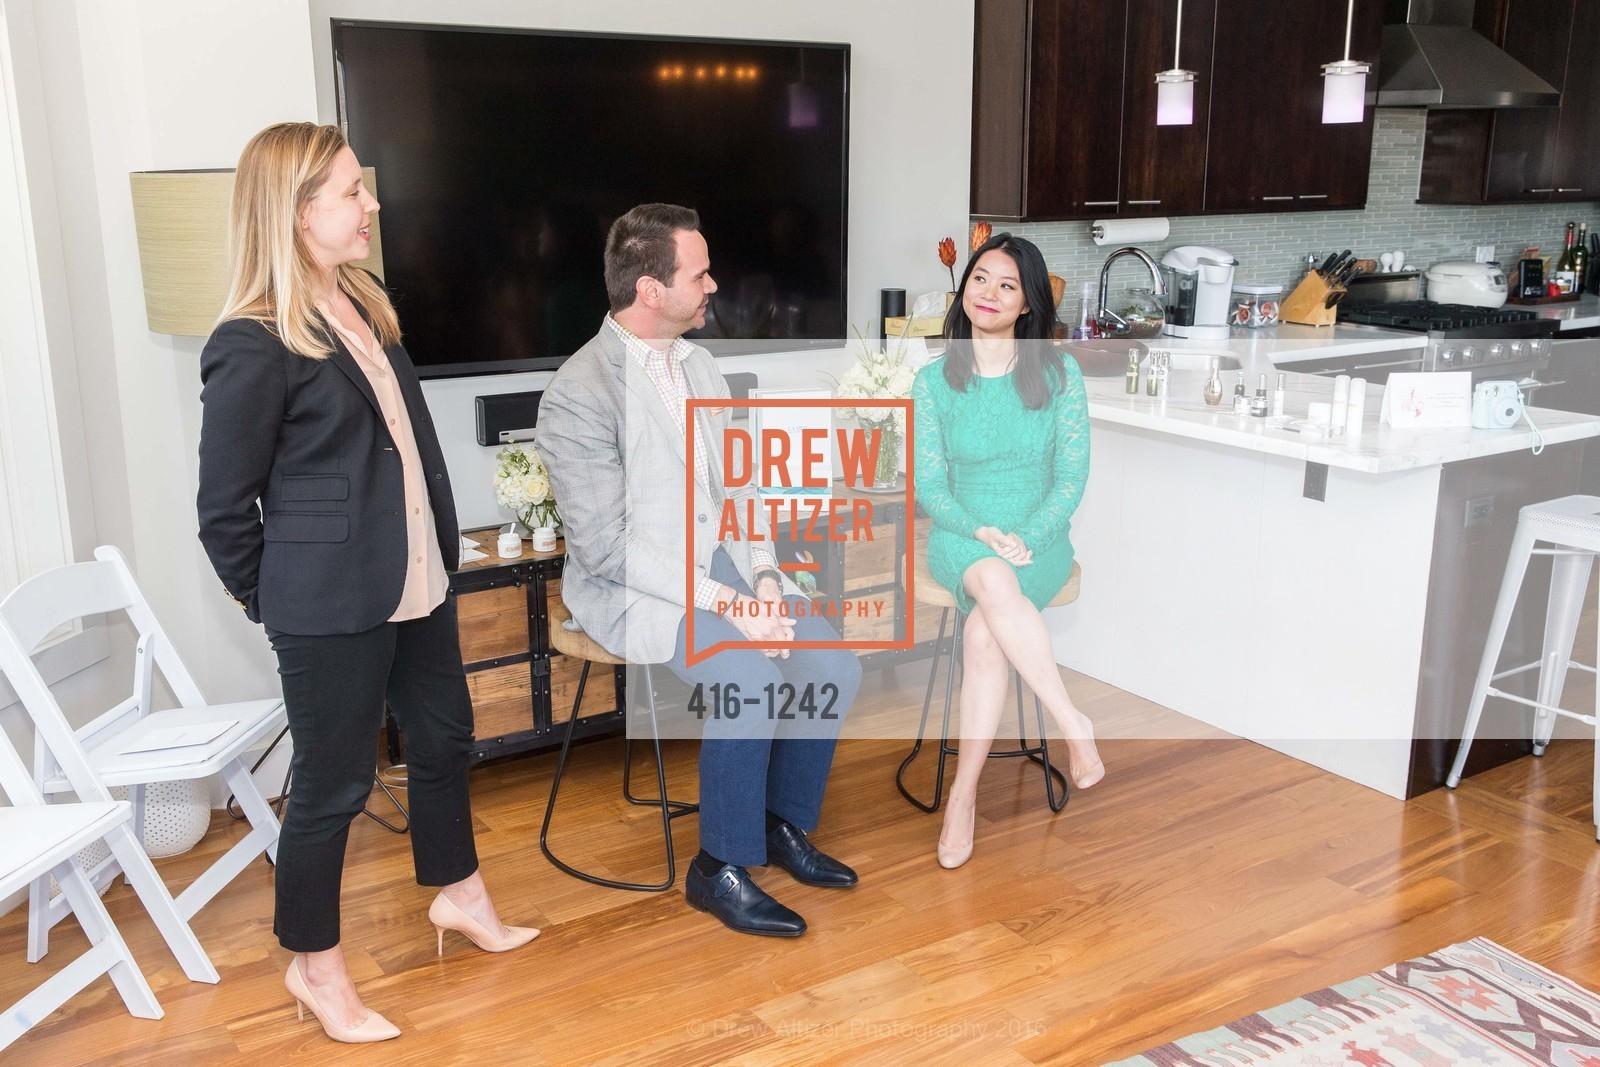 Lauren Murrow, Clyde Johnson, Michelle Lam, Photo #416-1242